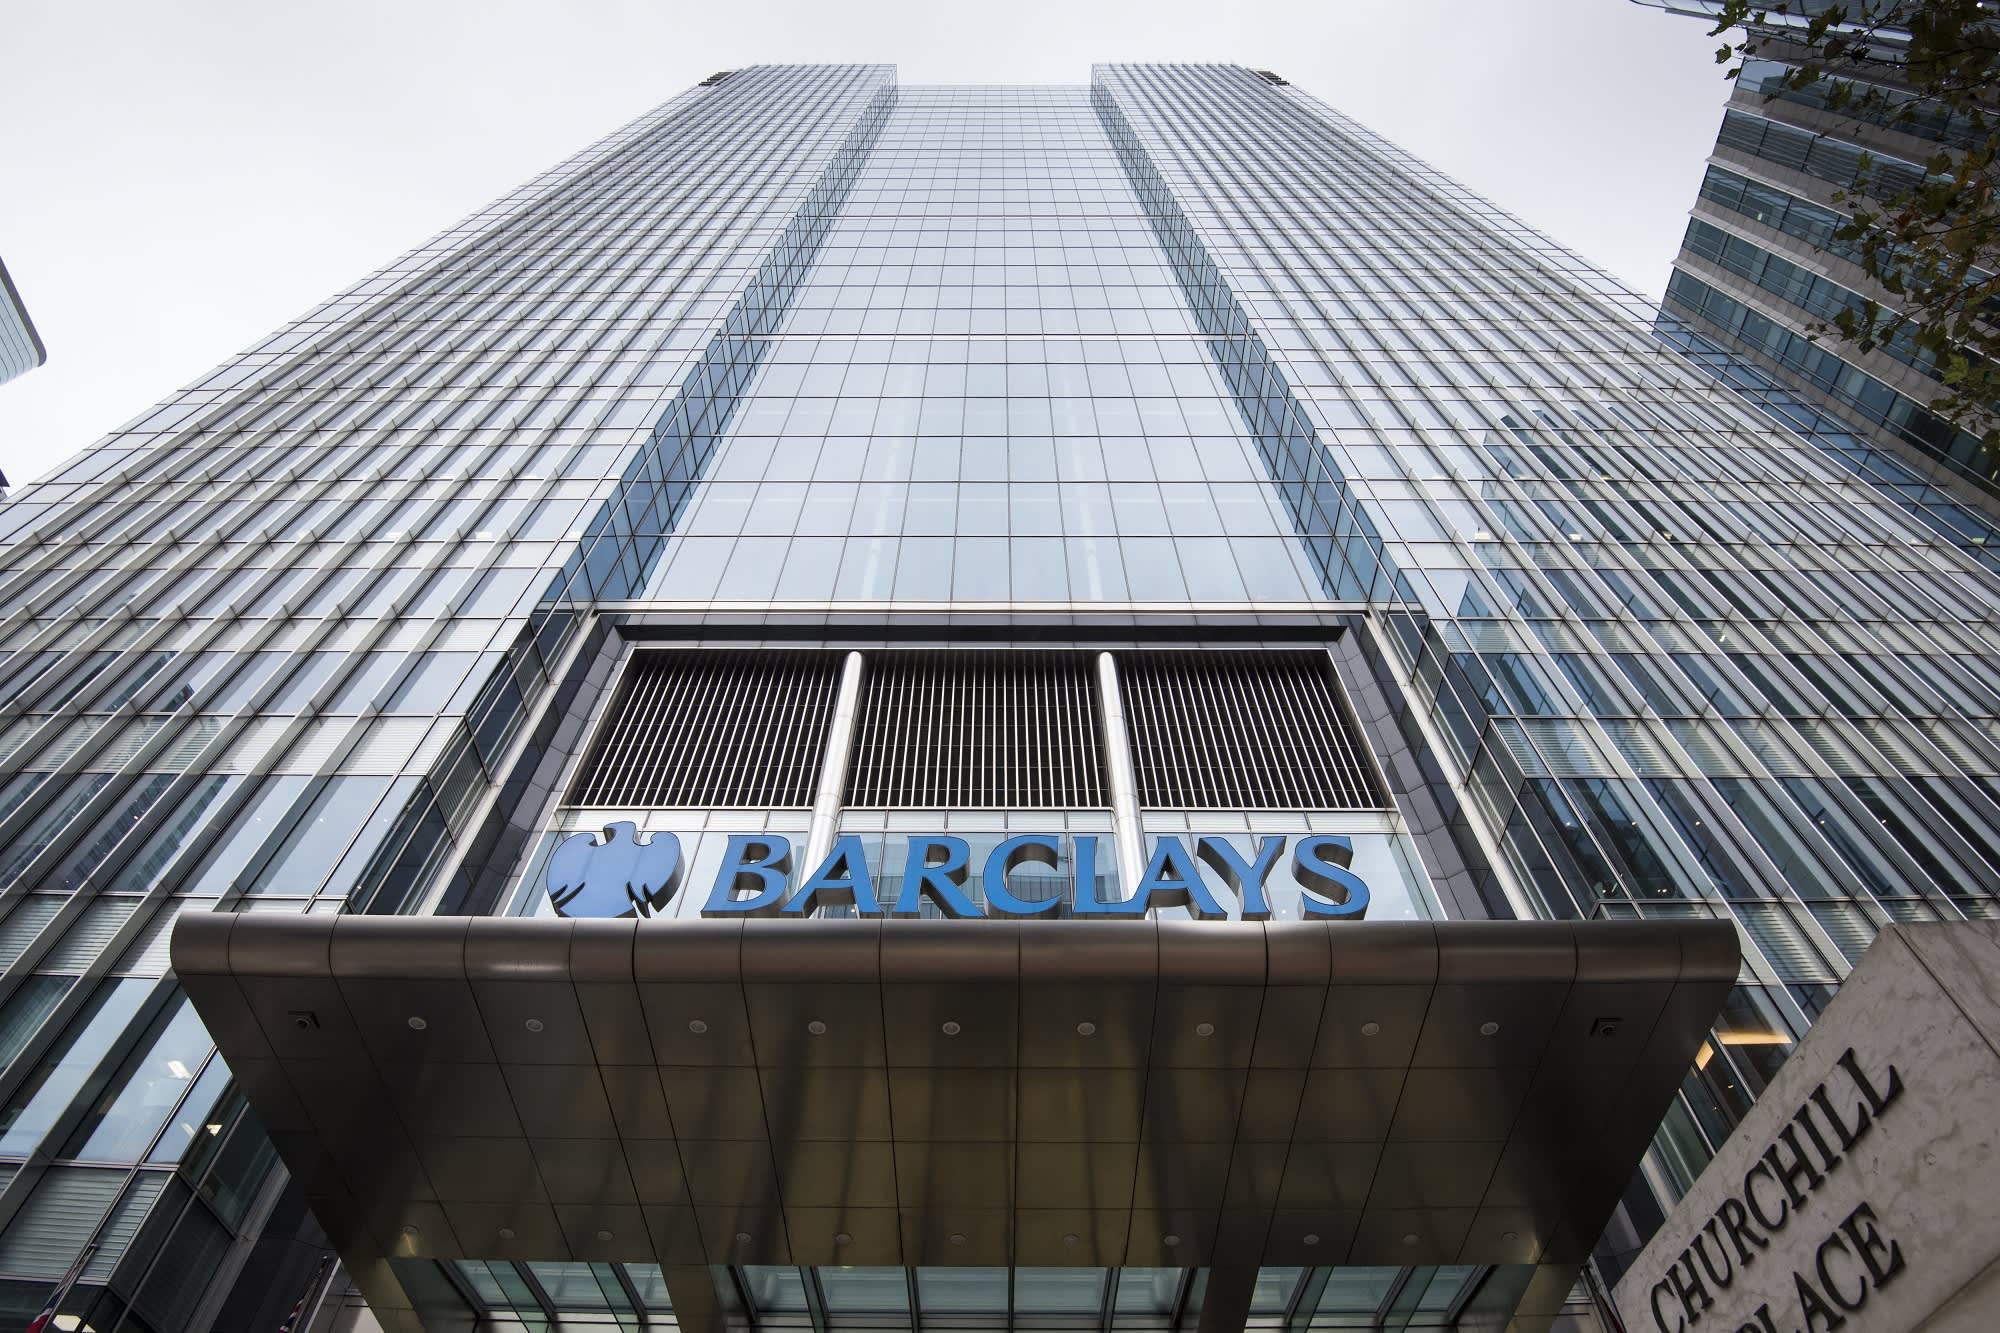 Barclays, JP Morgan among banks facing UK class action over currency-rigging